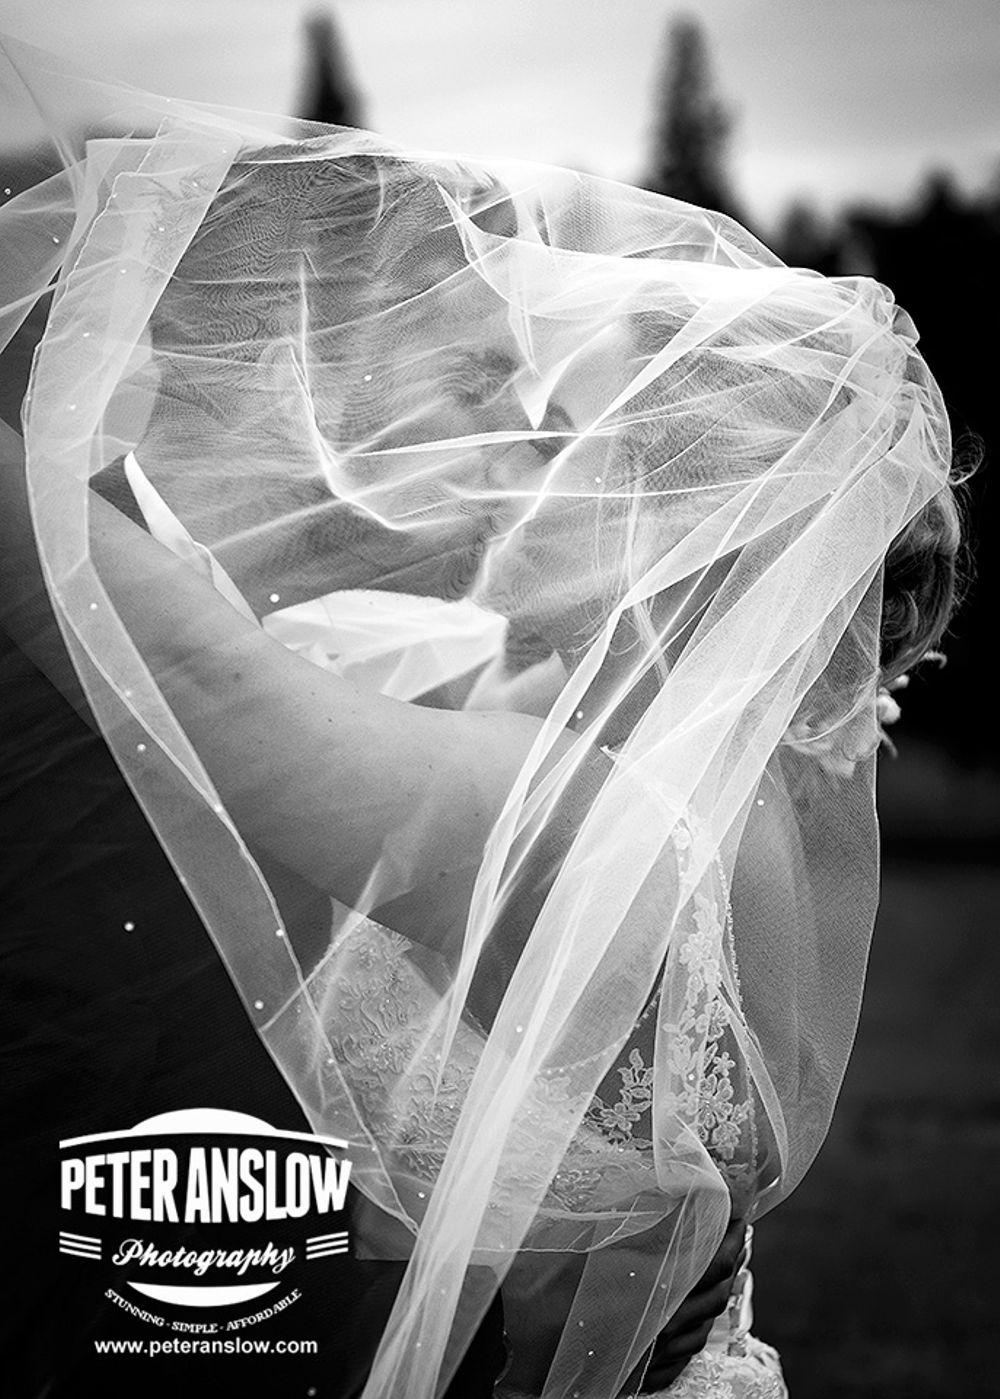 Peter Anslow photo